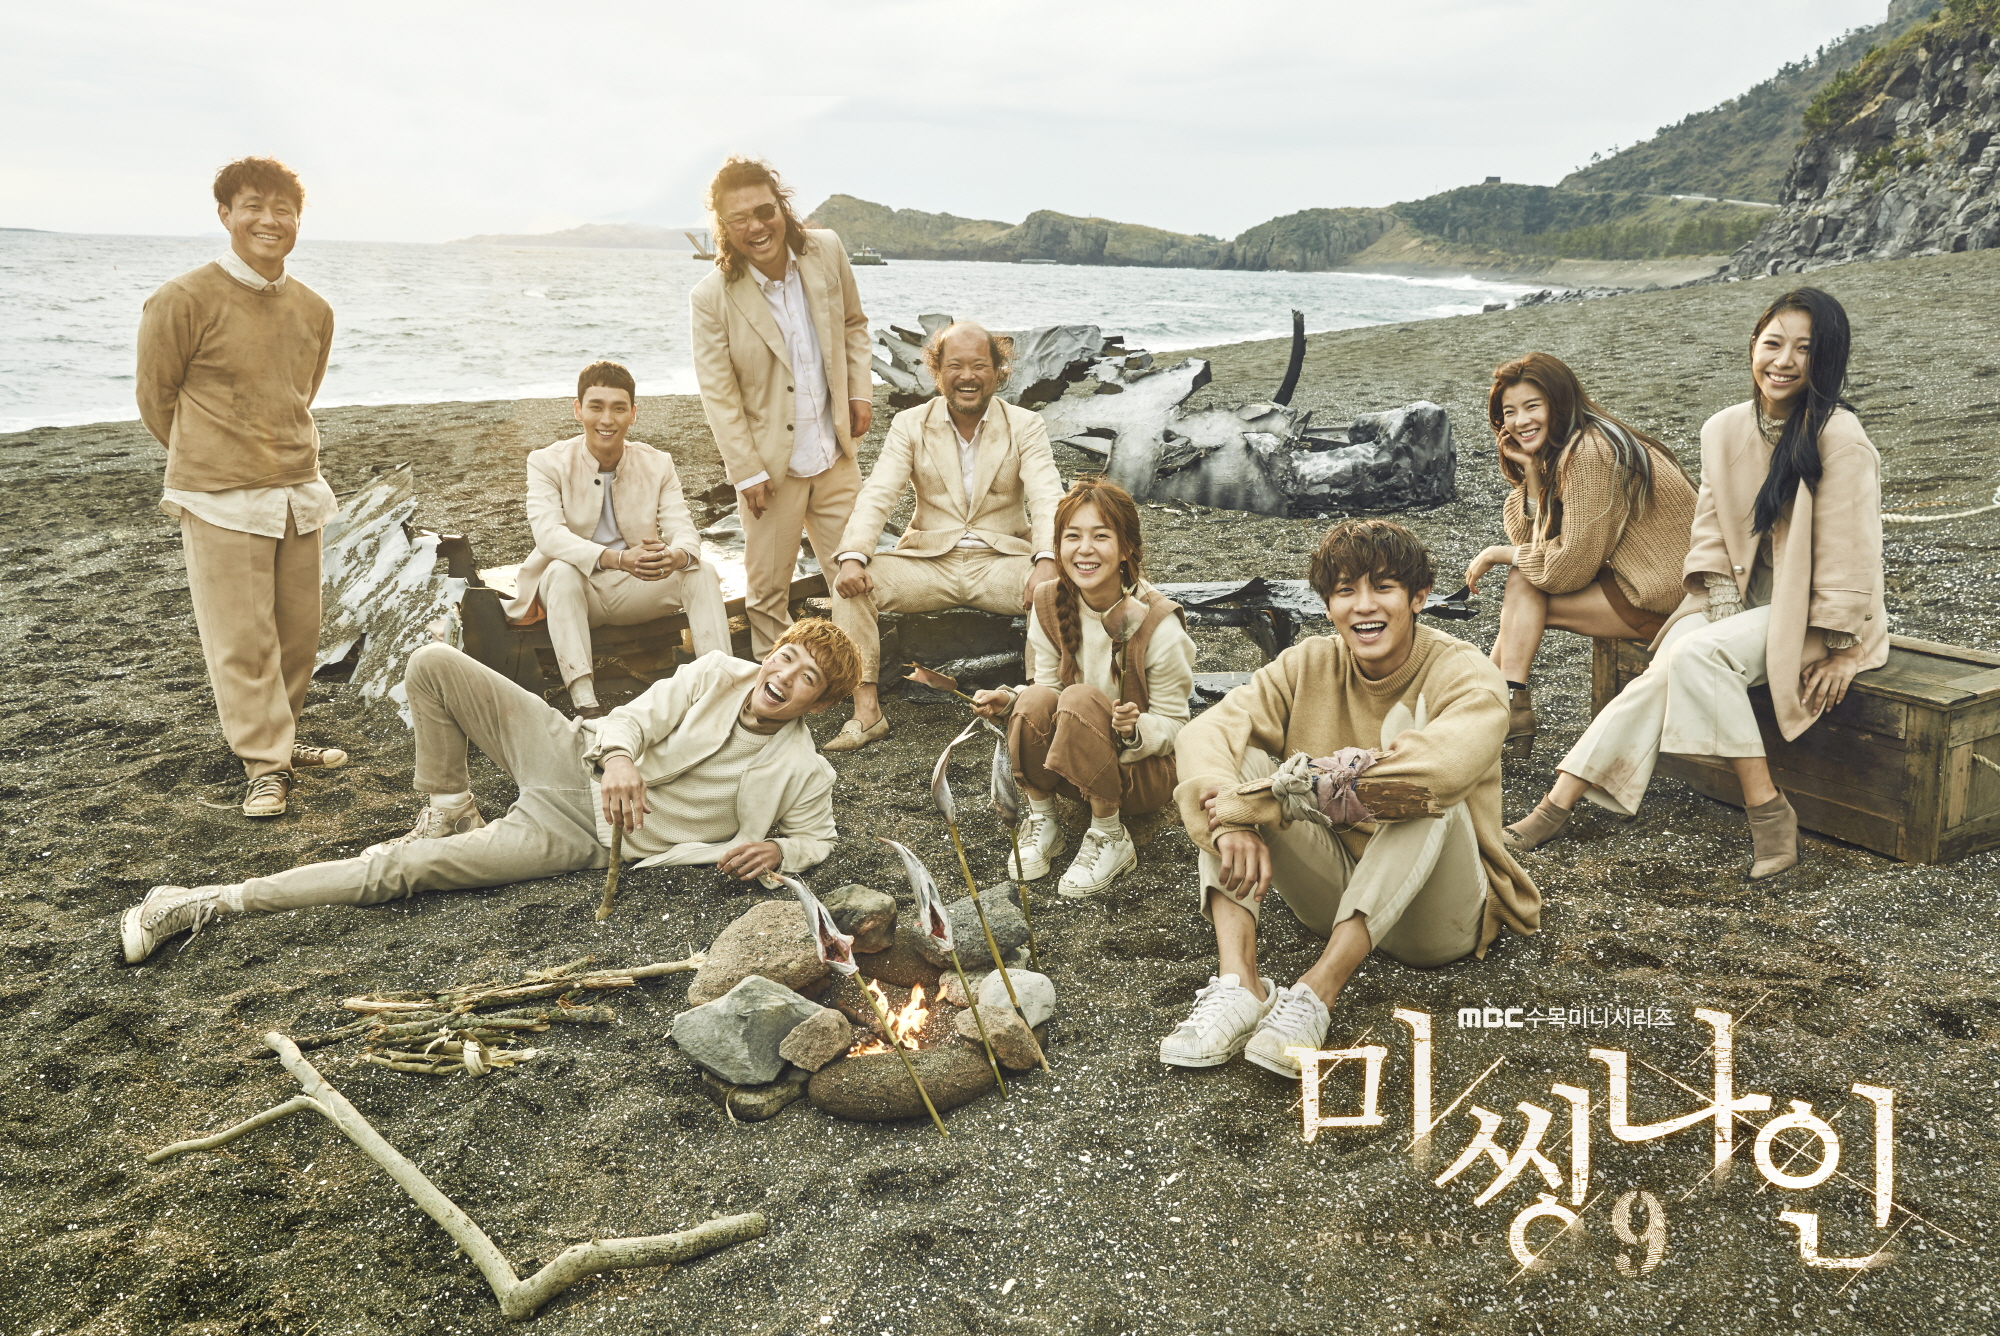 Drama Missing 9 yang melakukan pengambilan gambar di Pantai Jeju Salt